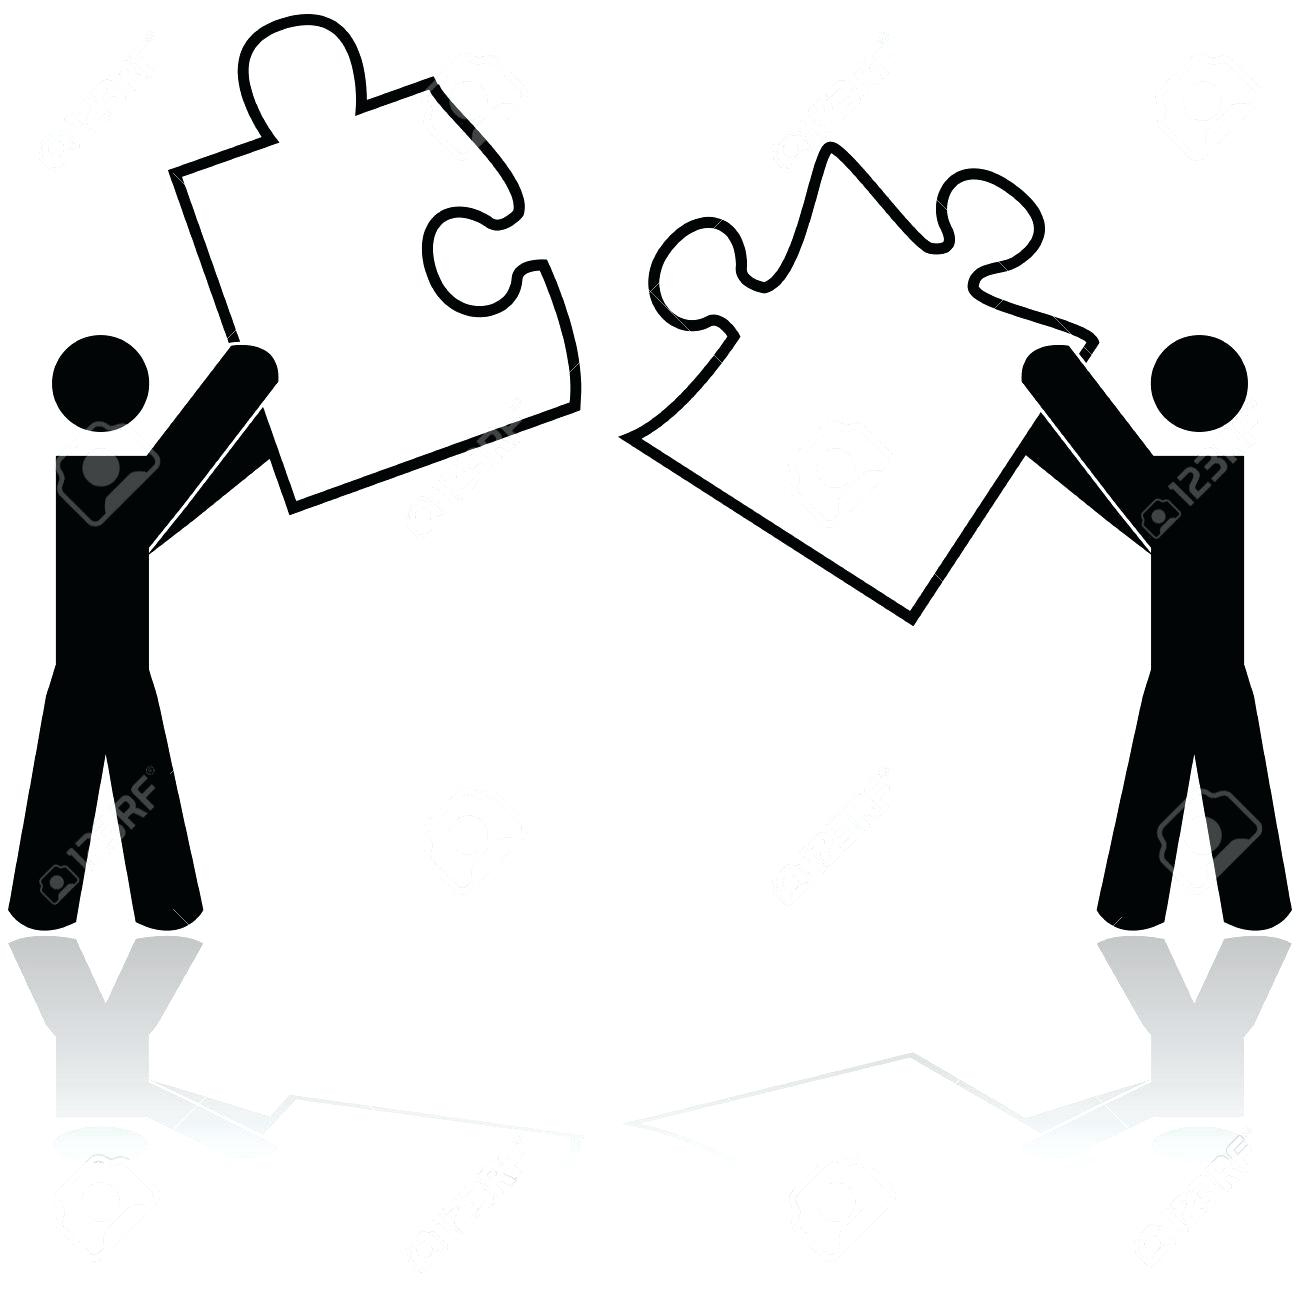 5 Piece Puzzle | Free Download Best 5 Piece Puzzle On Clipartmag - 5 Piece Printable Puzzle